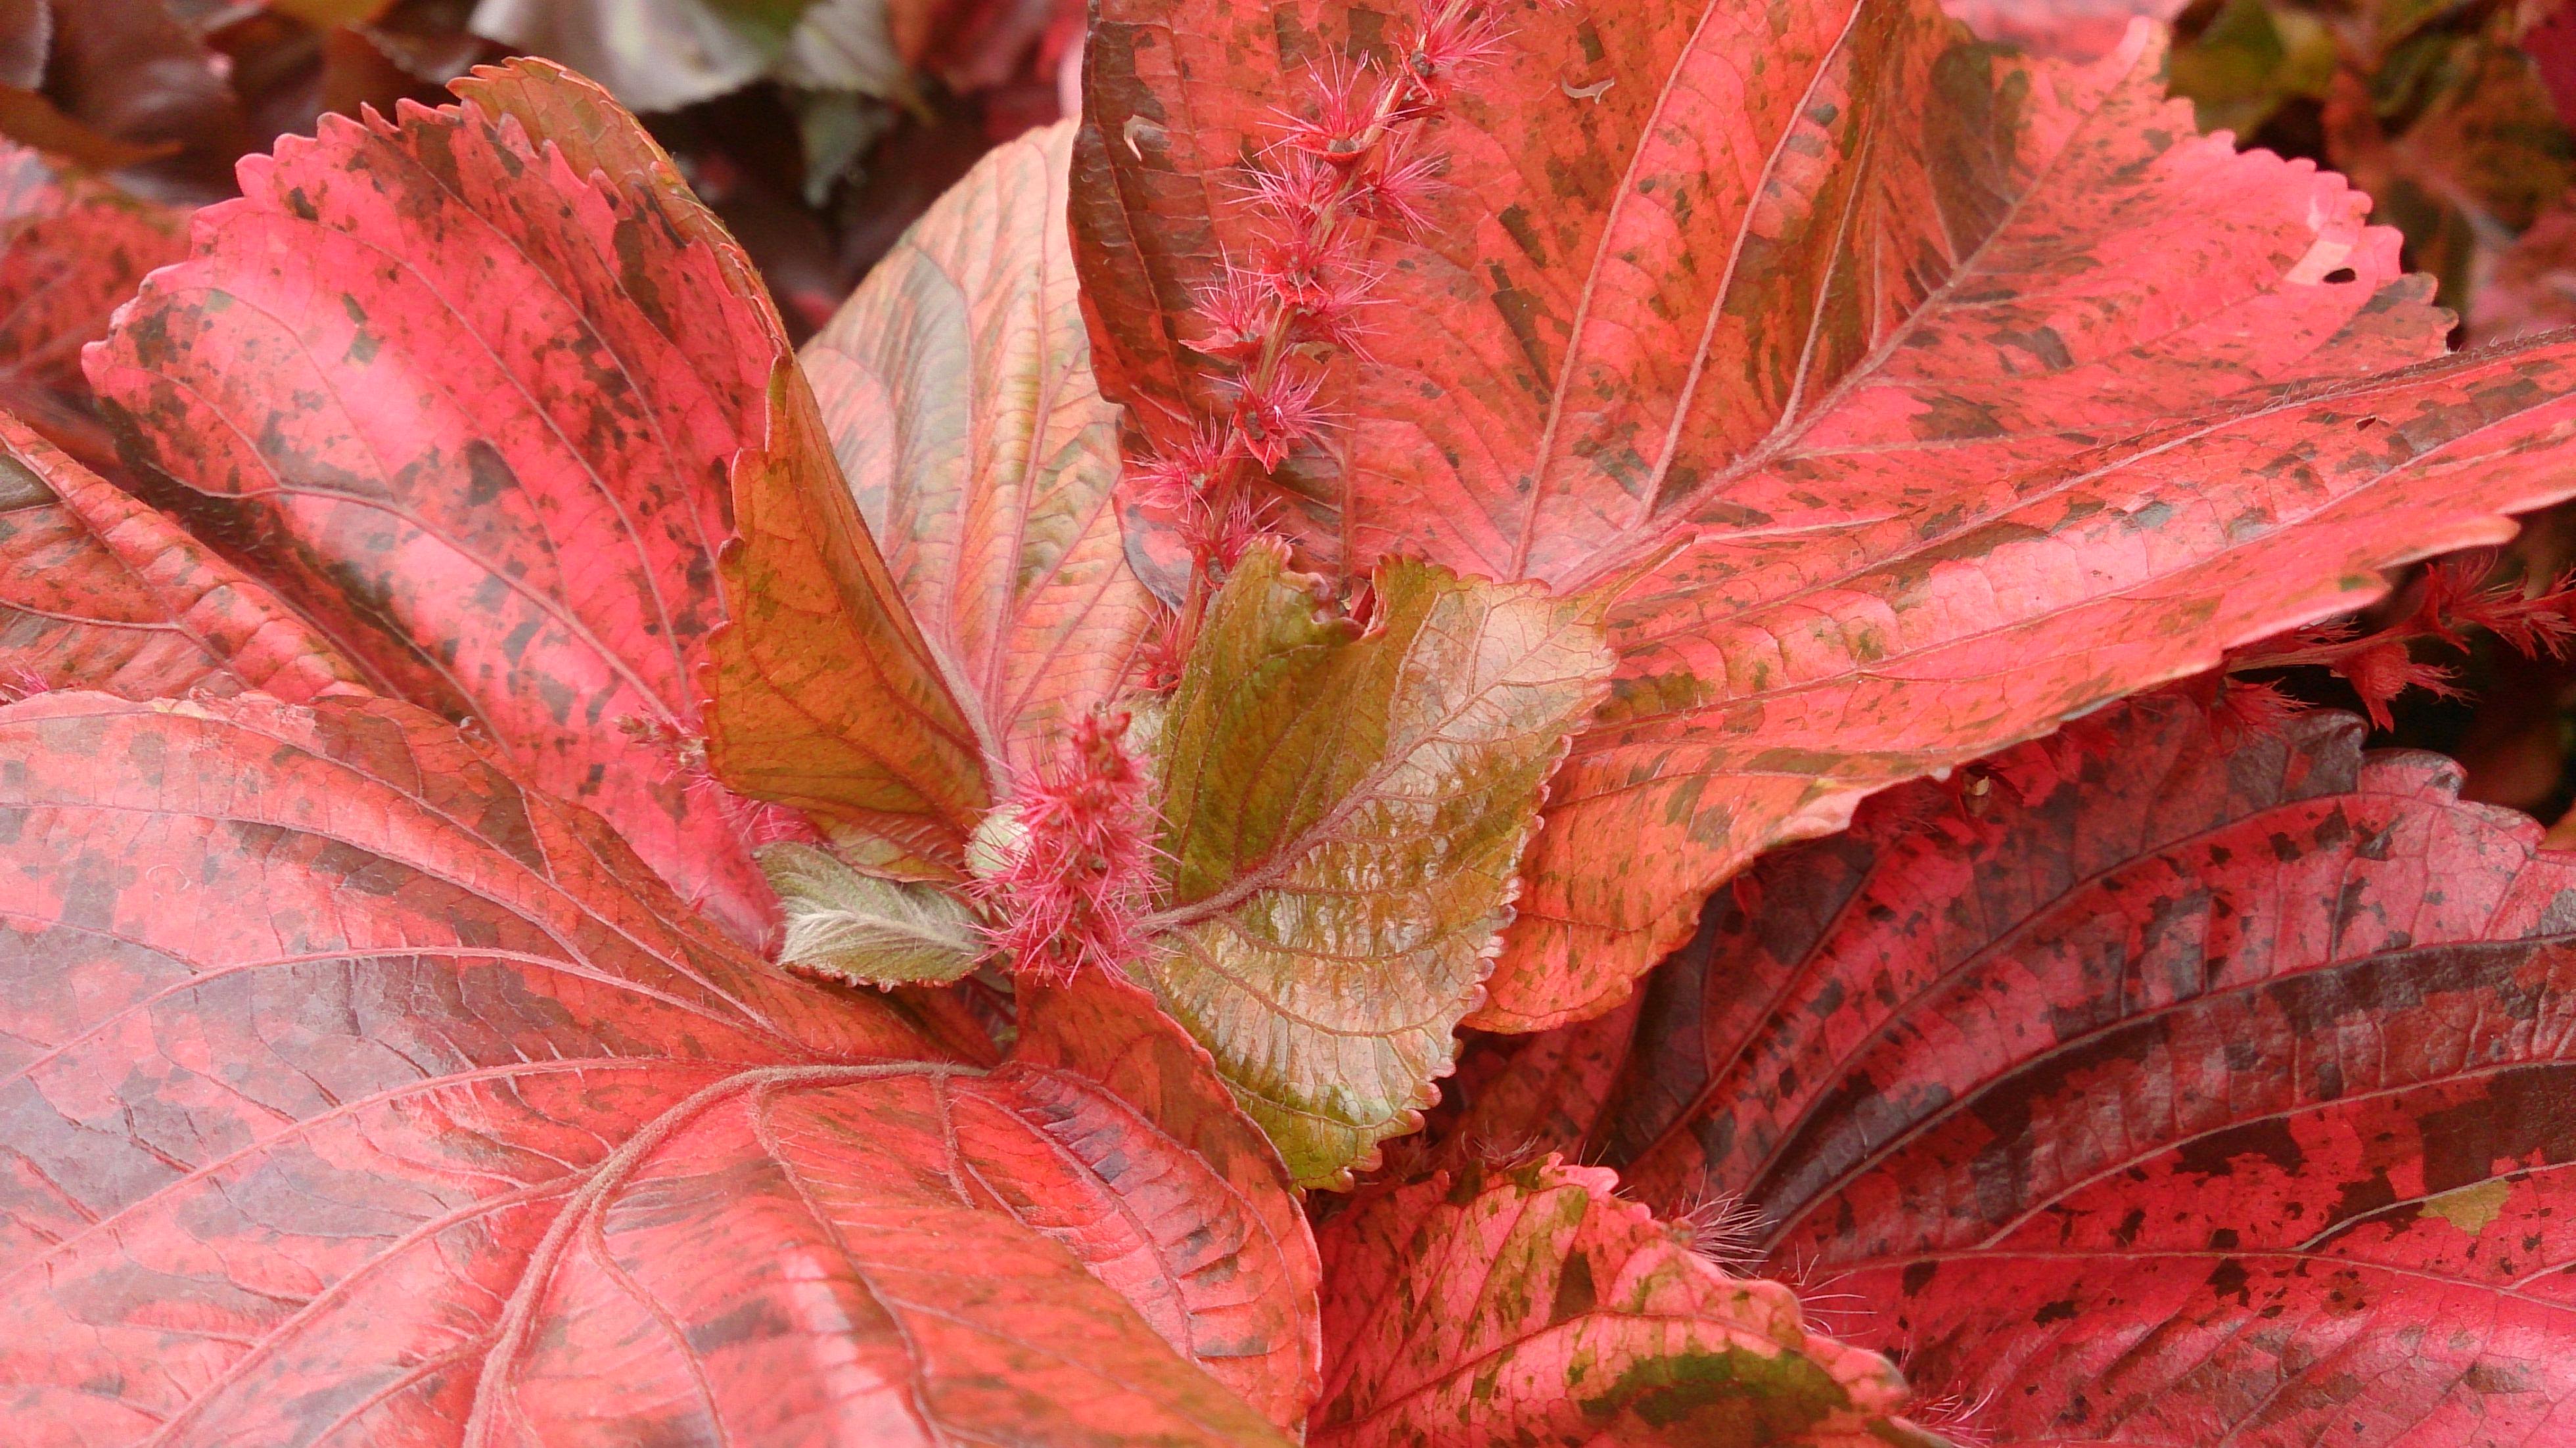 Filecopper Plant Acalypha Wilkesiana Mosaica 2jpg Wikimedia